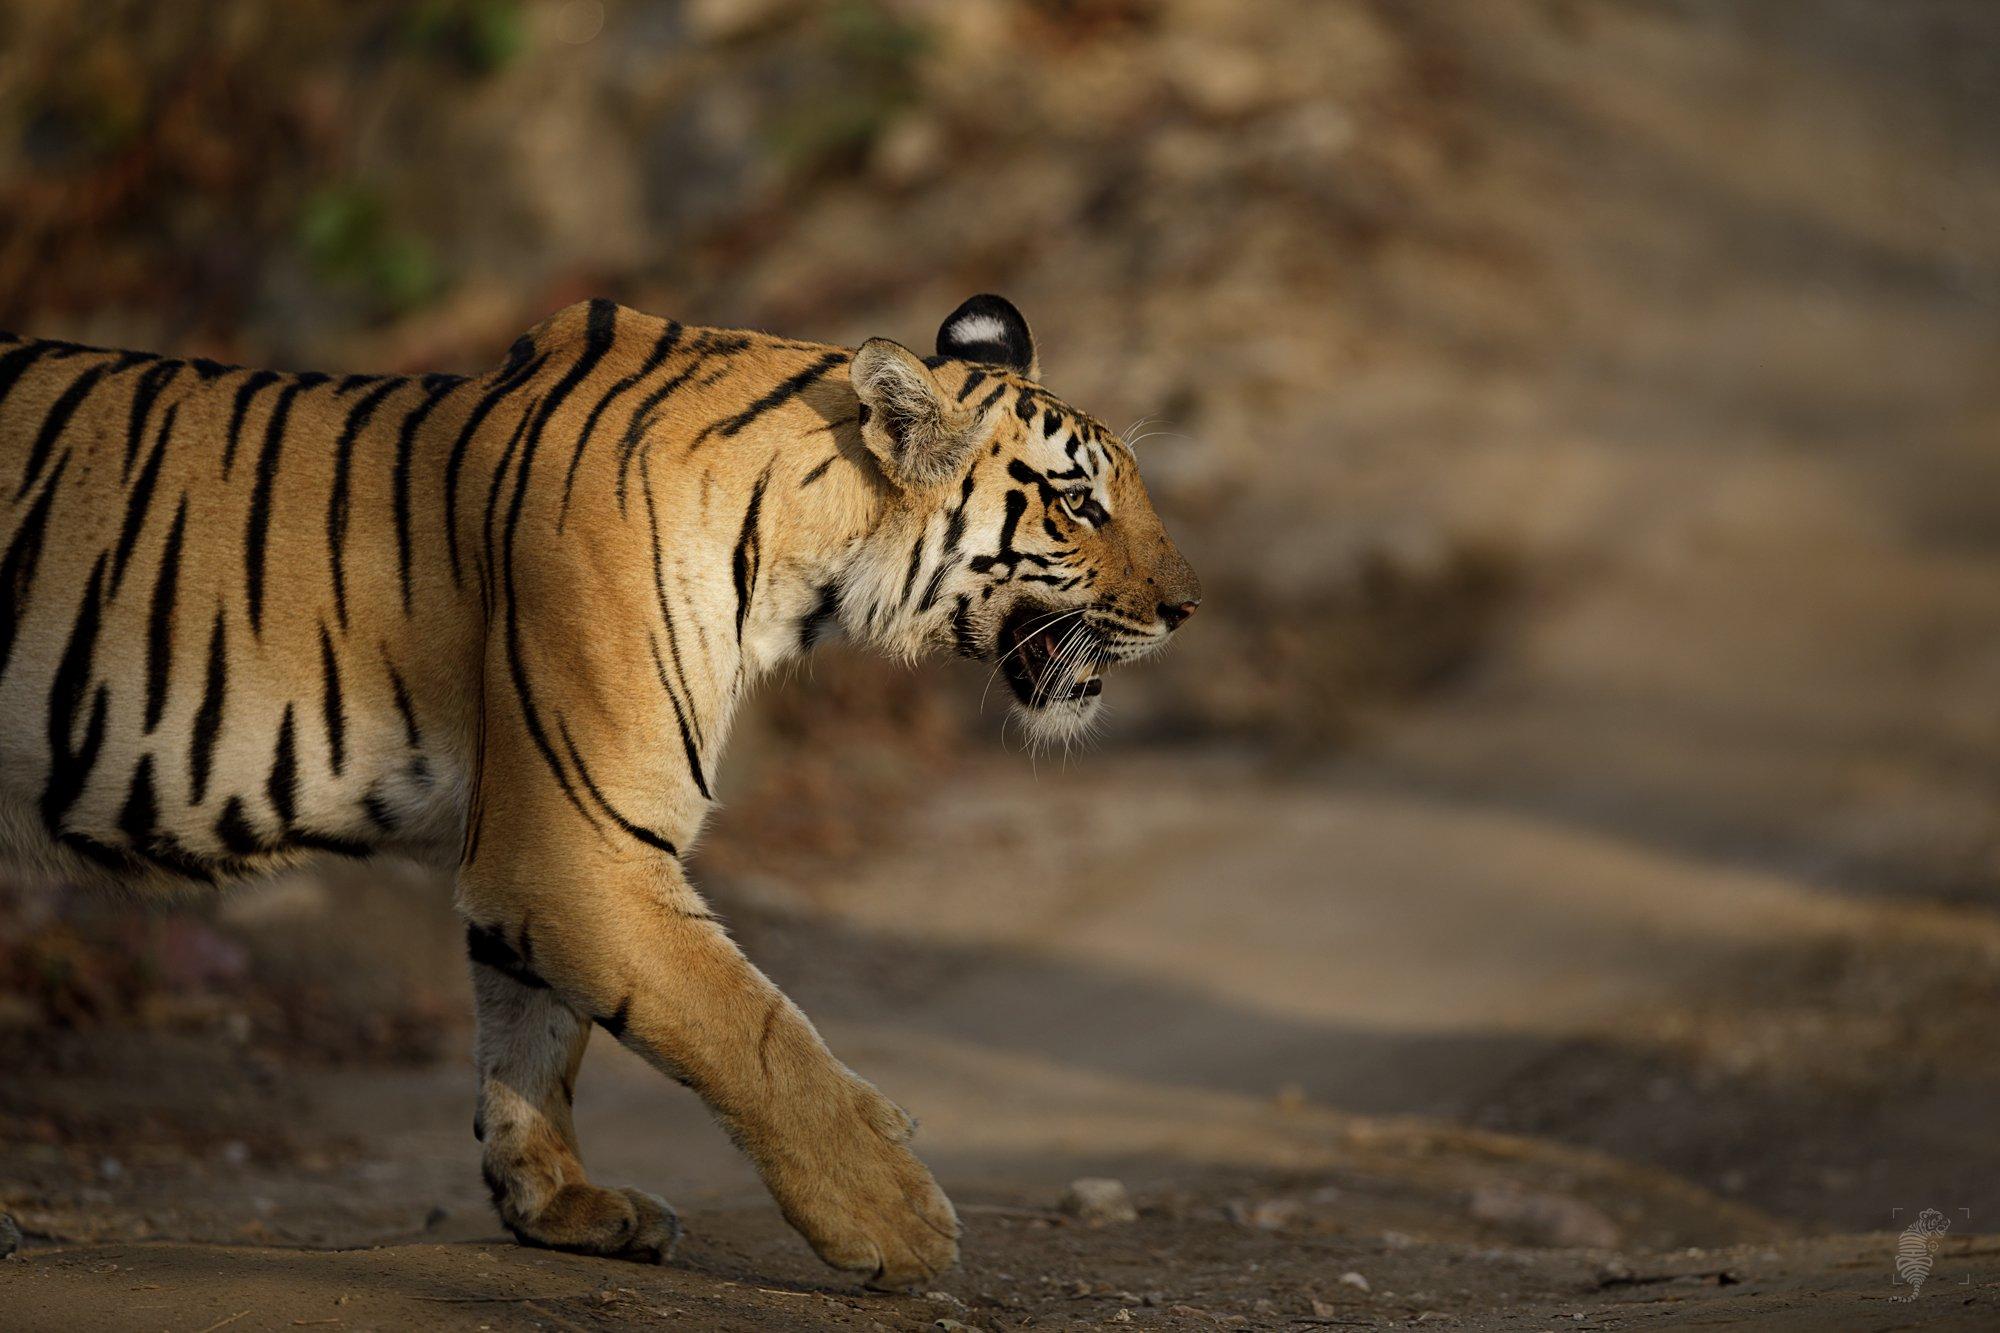 #Wildlife #Canon #India #Tigers #Sunlight #500mm, D Abhijit